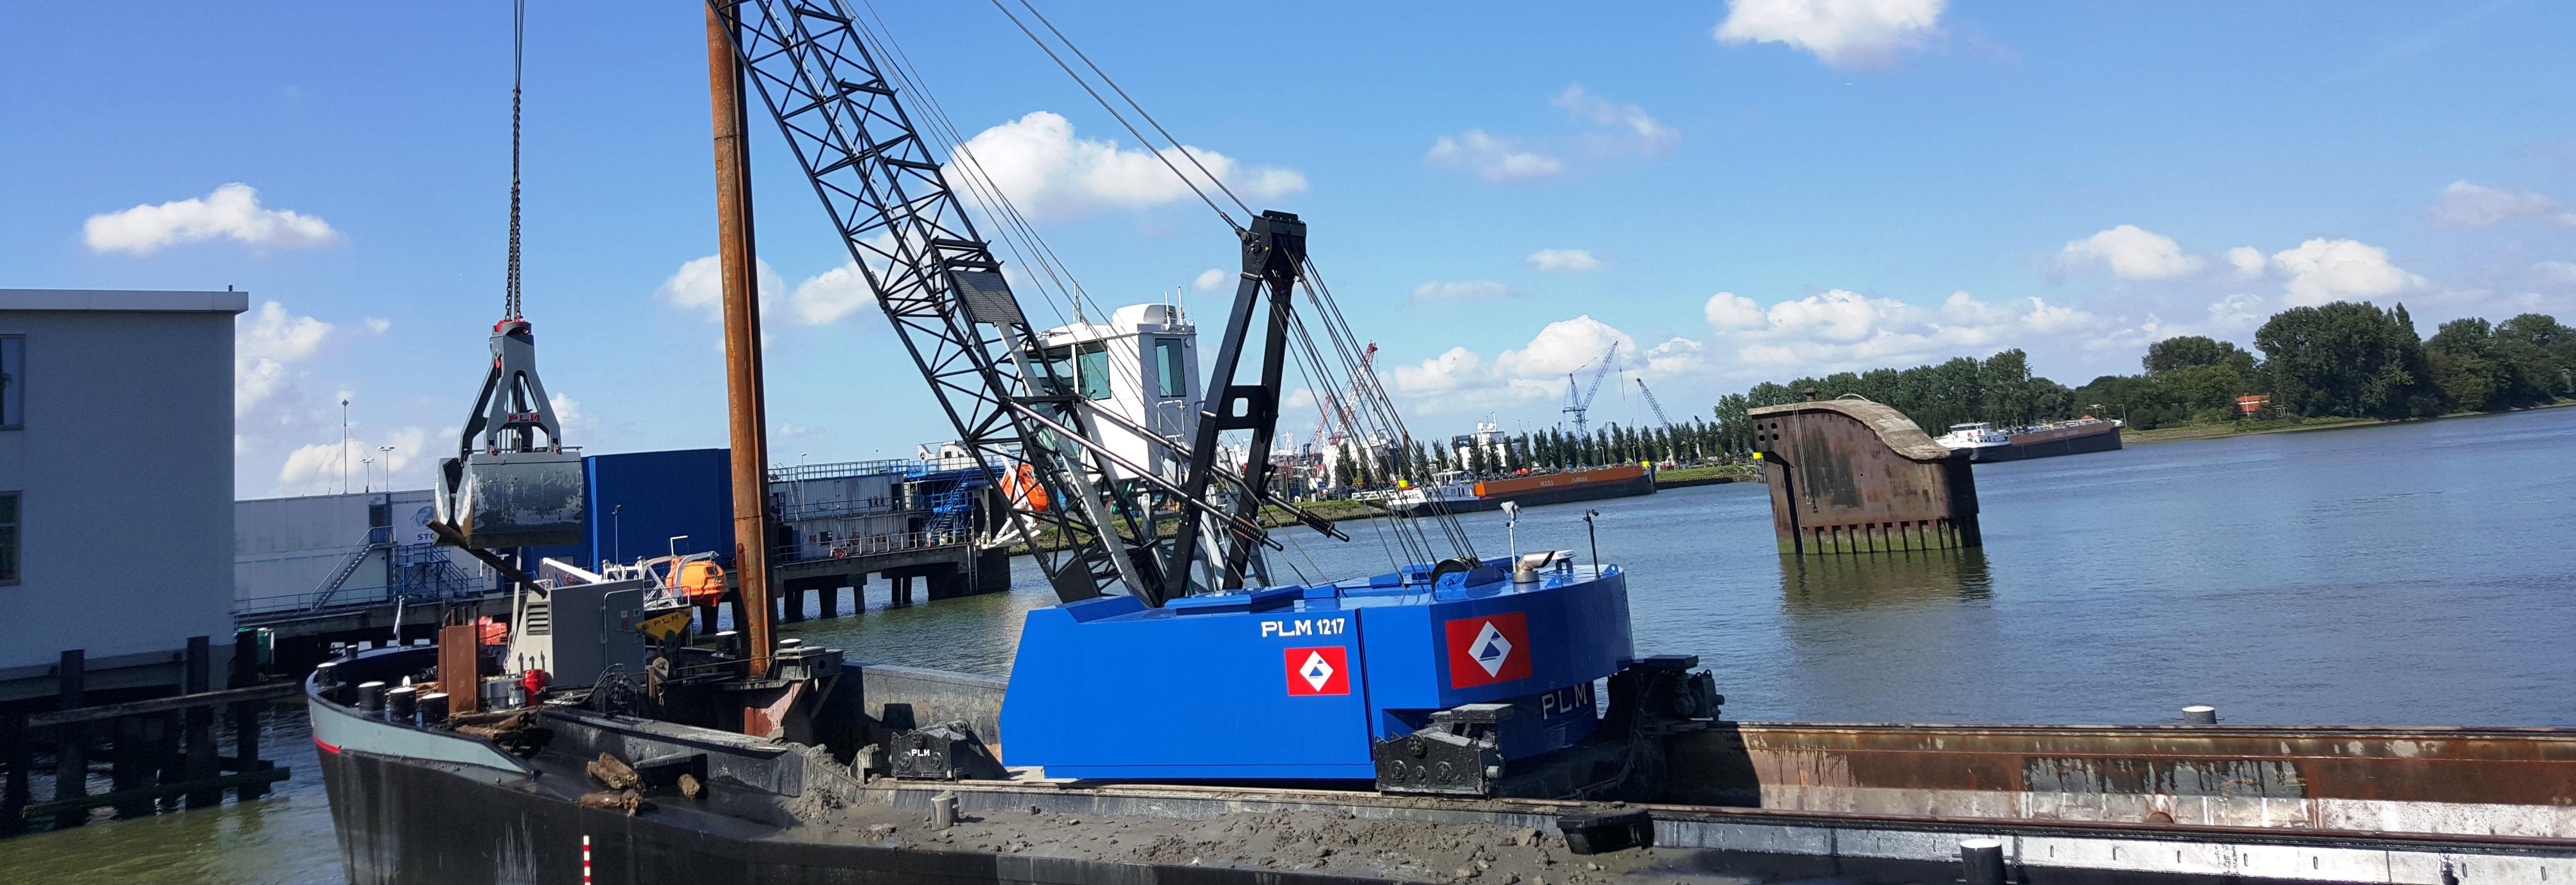 PLM 1217 dredging crane